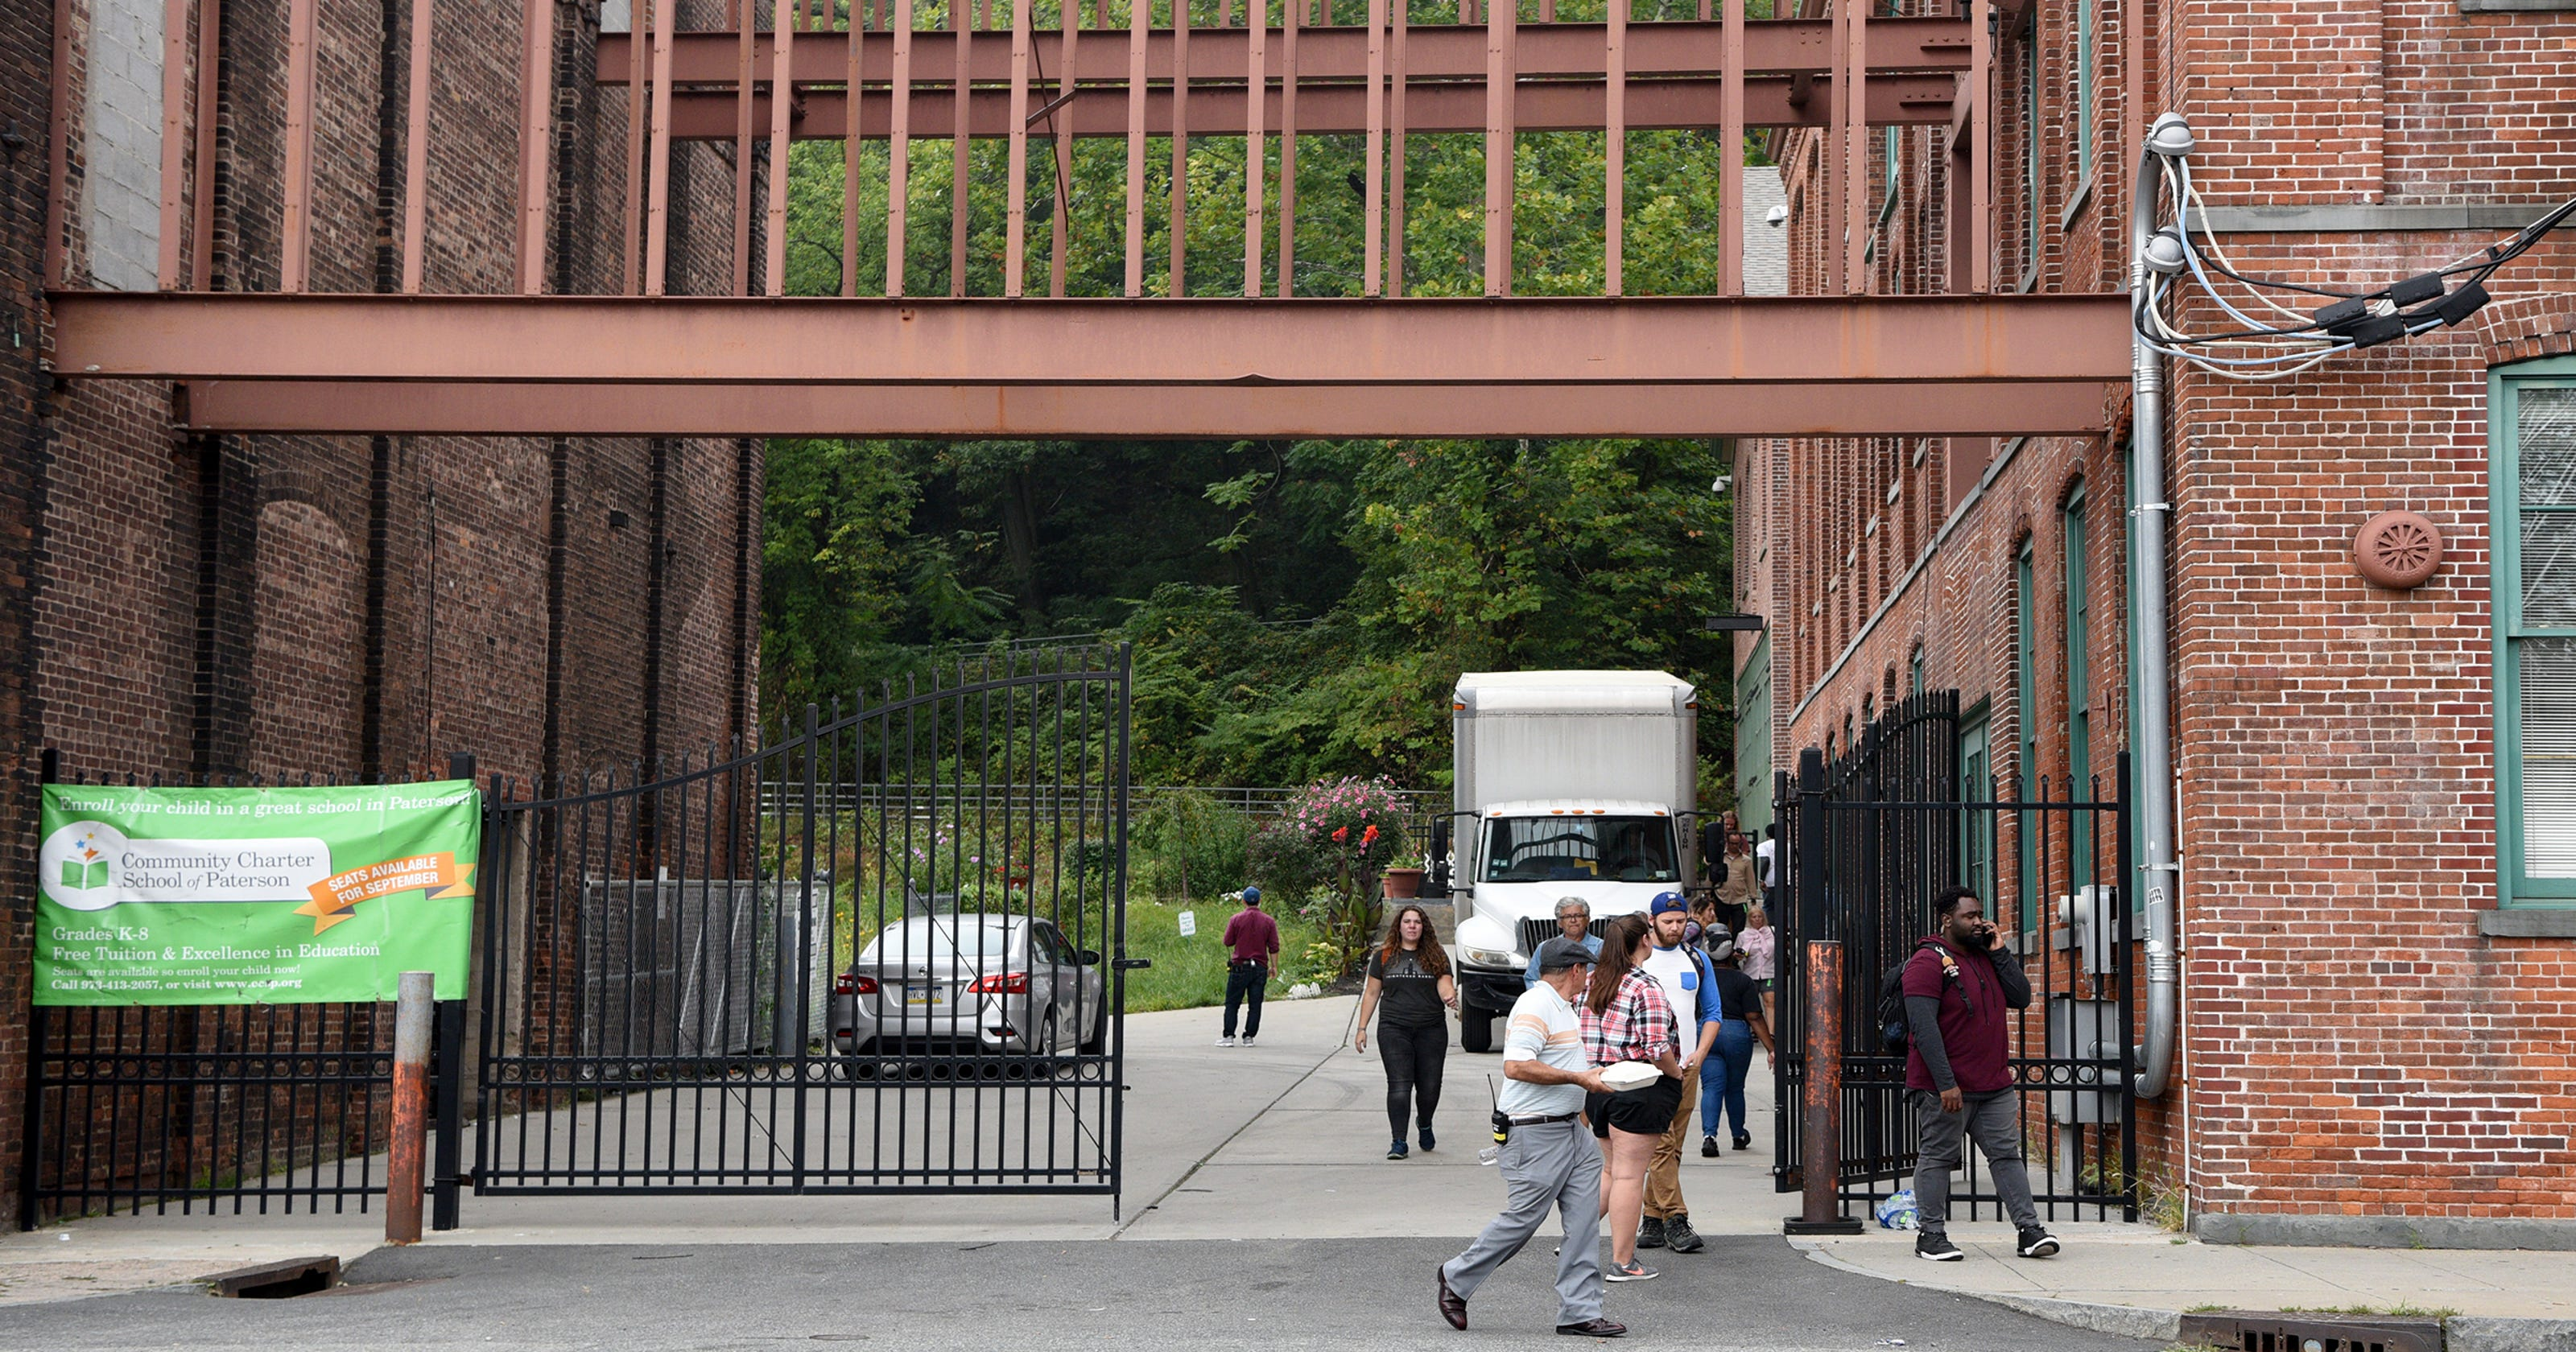 Scorsese film crew shooting scenes in Paterson